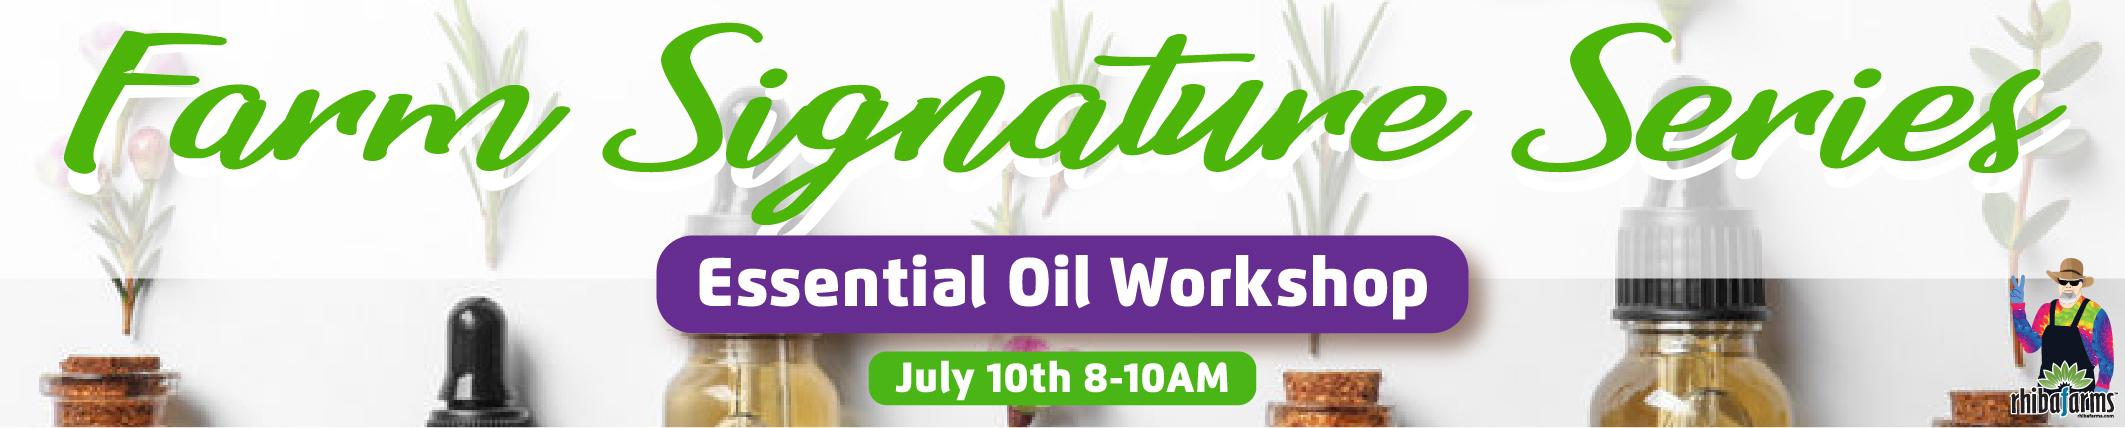 Essential Oil Workshop near me